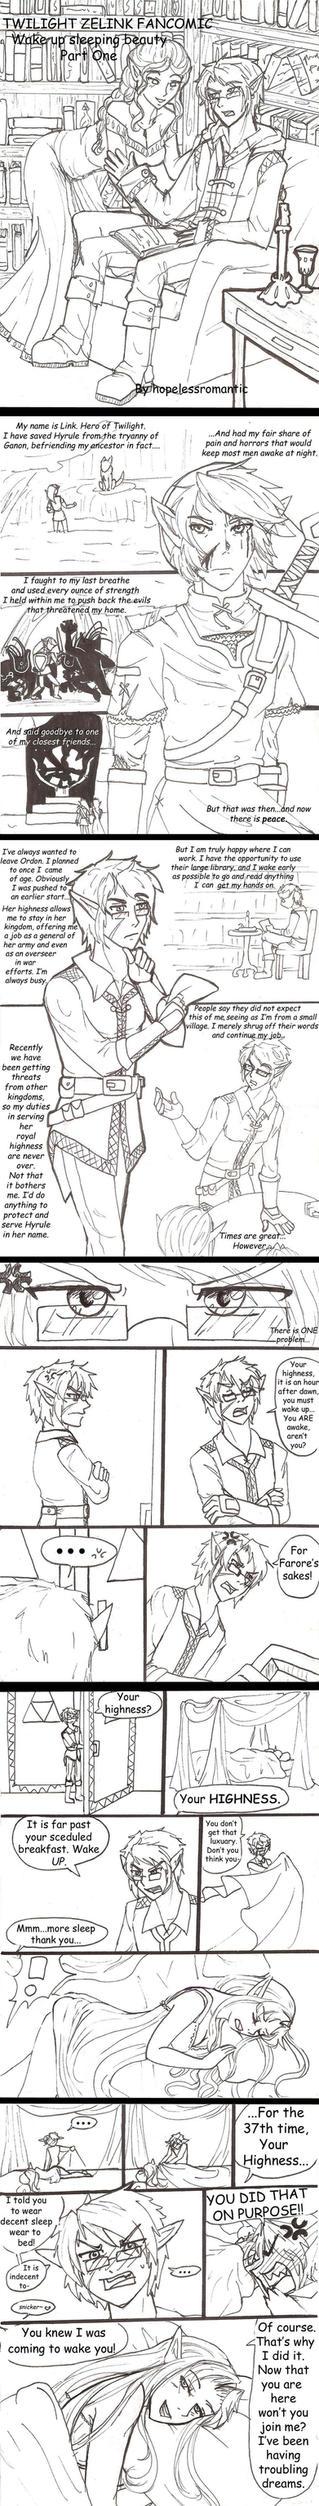 TP Wake up Sleeping Zelda: Part 1 by hopelessromantic721